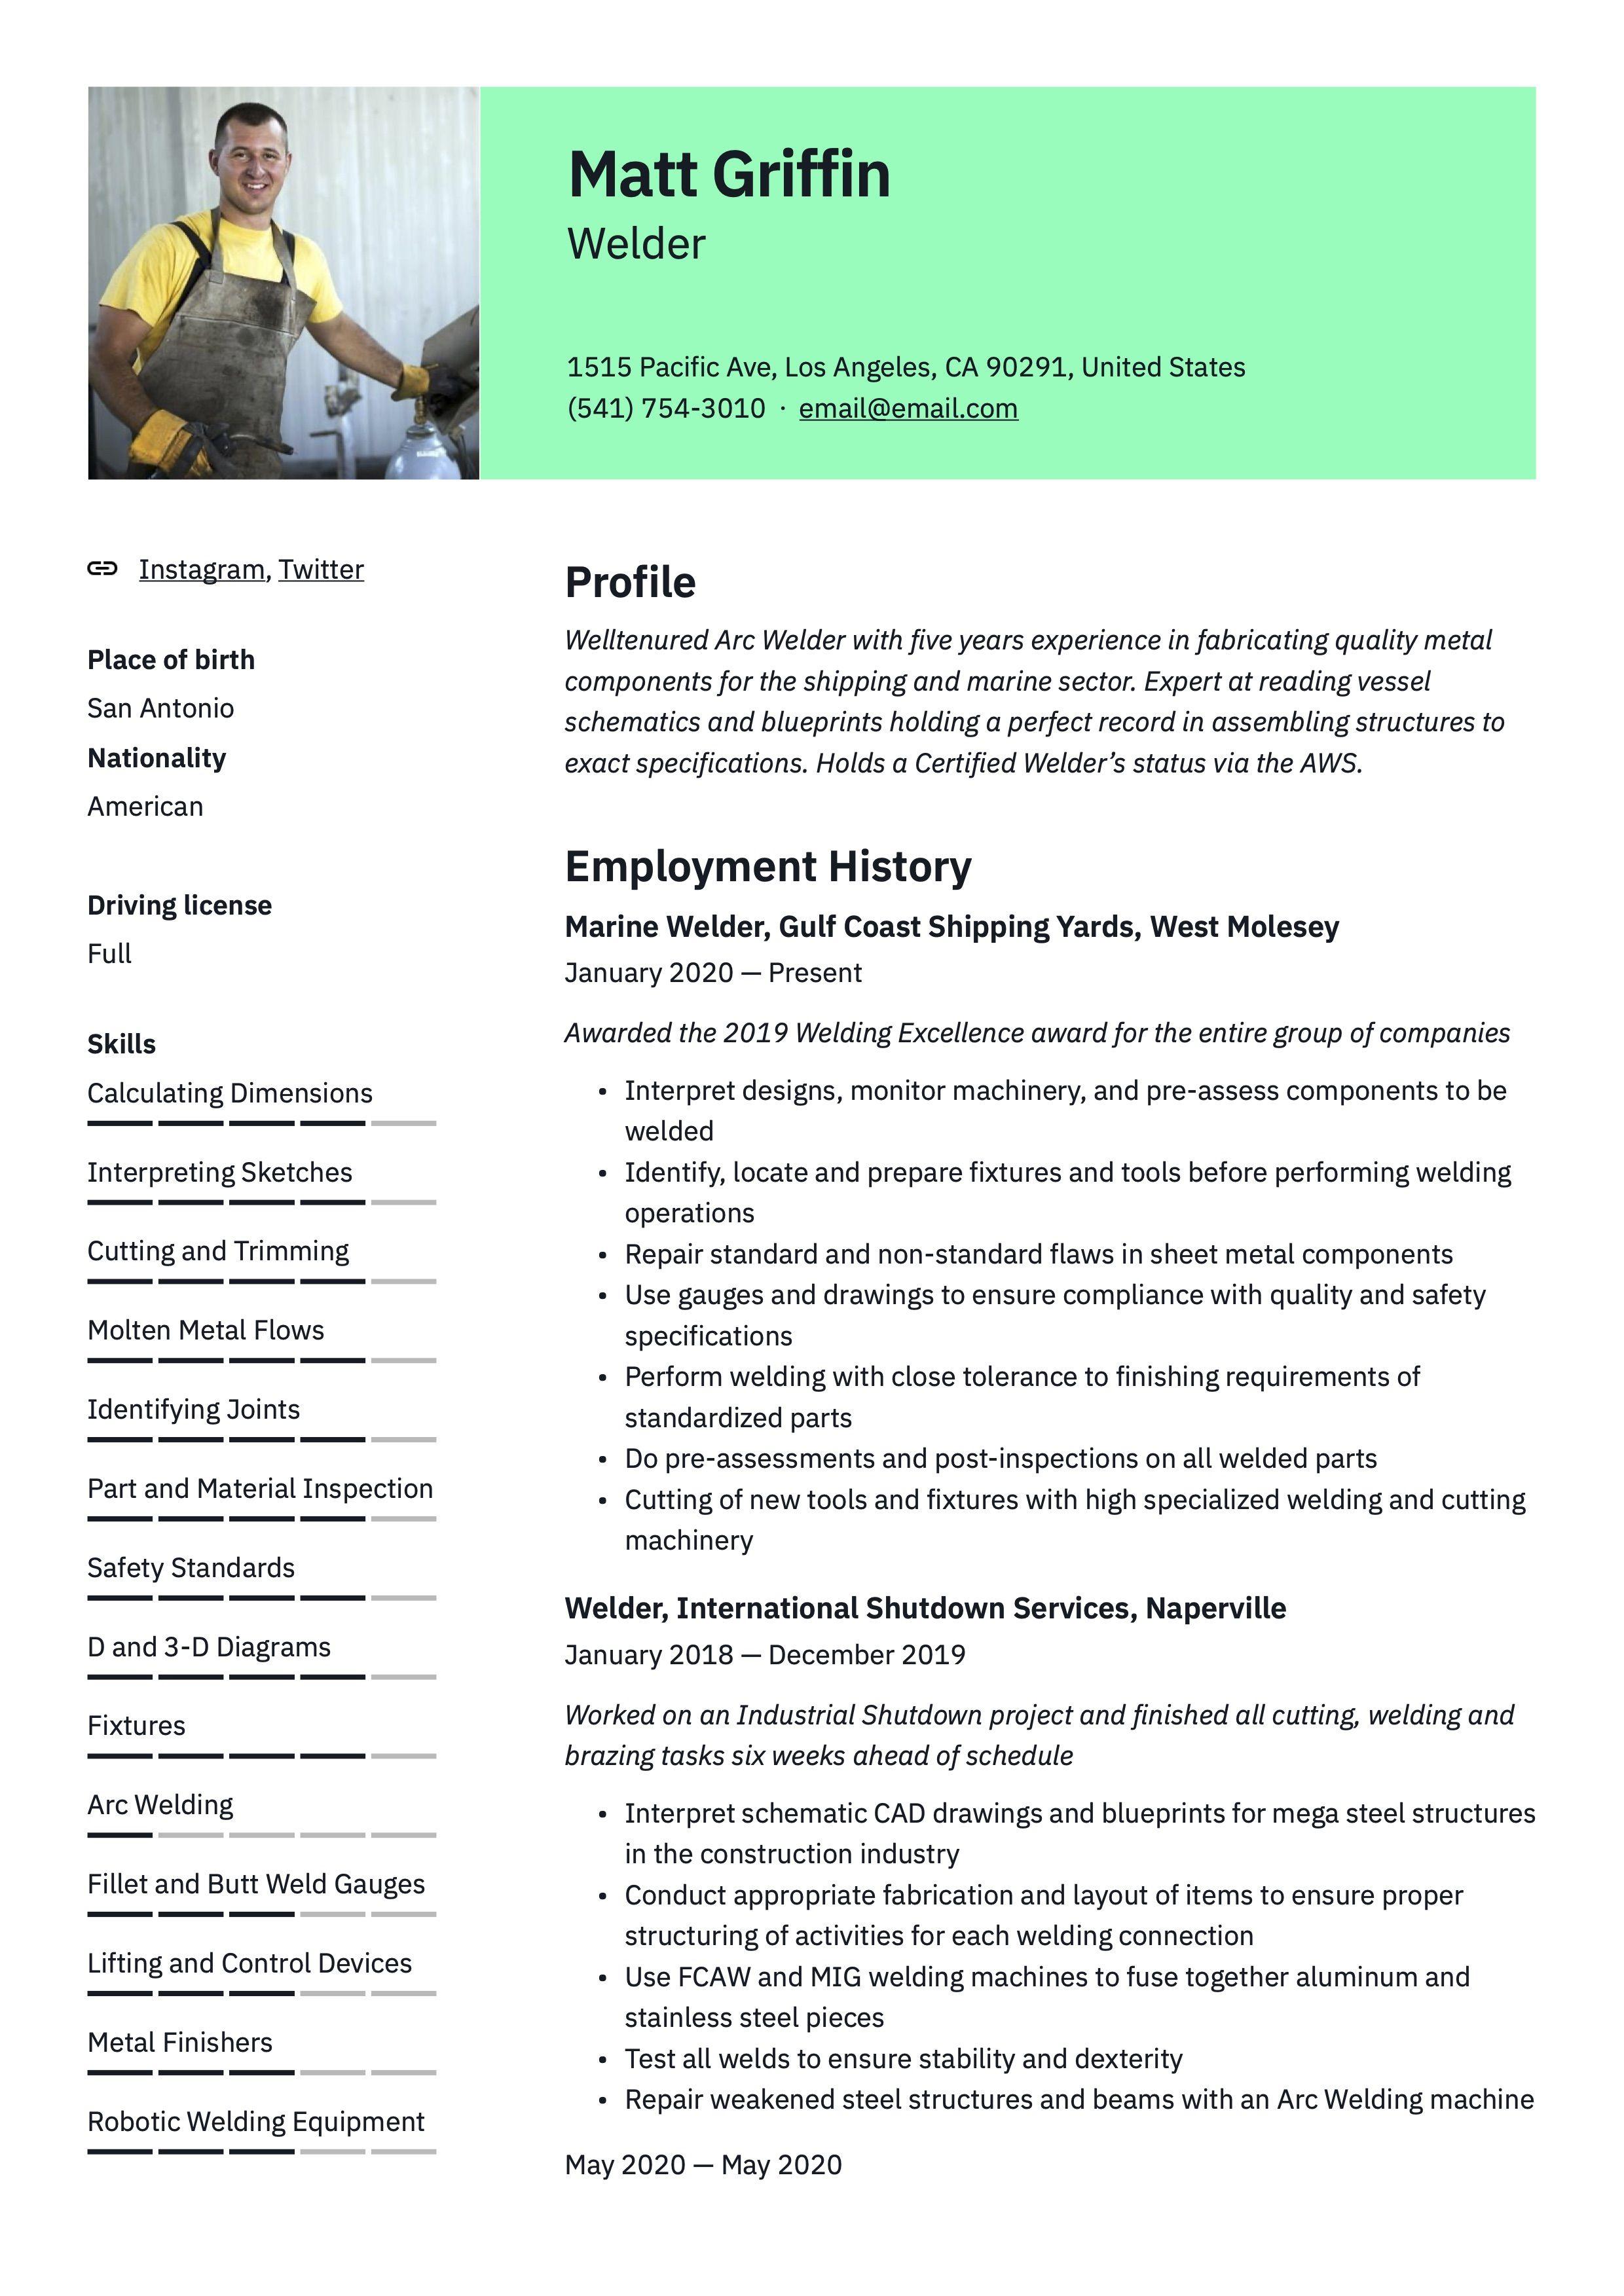 Welder Resume Example Resume Examples Professional Resume Examples Resume Guide